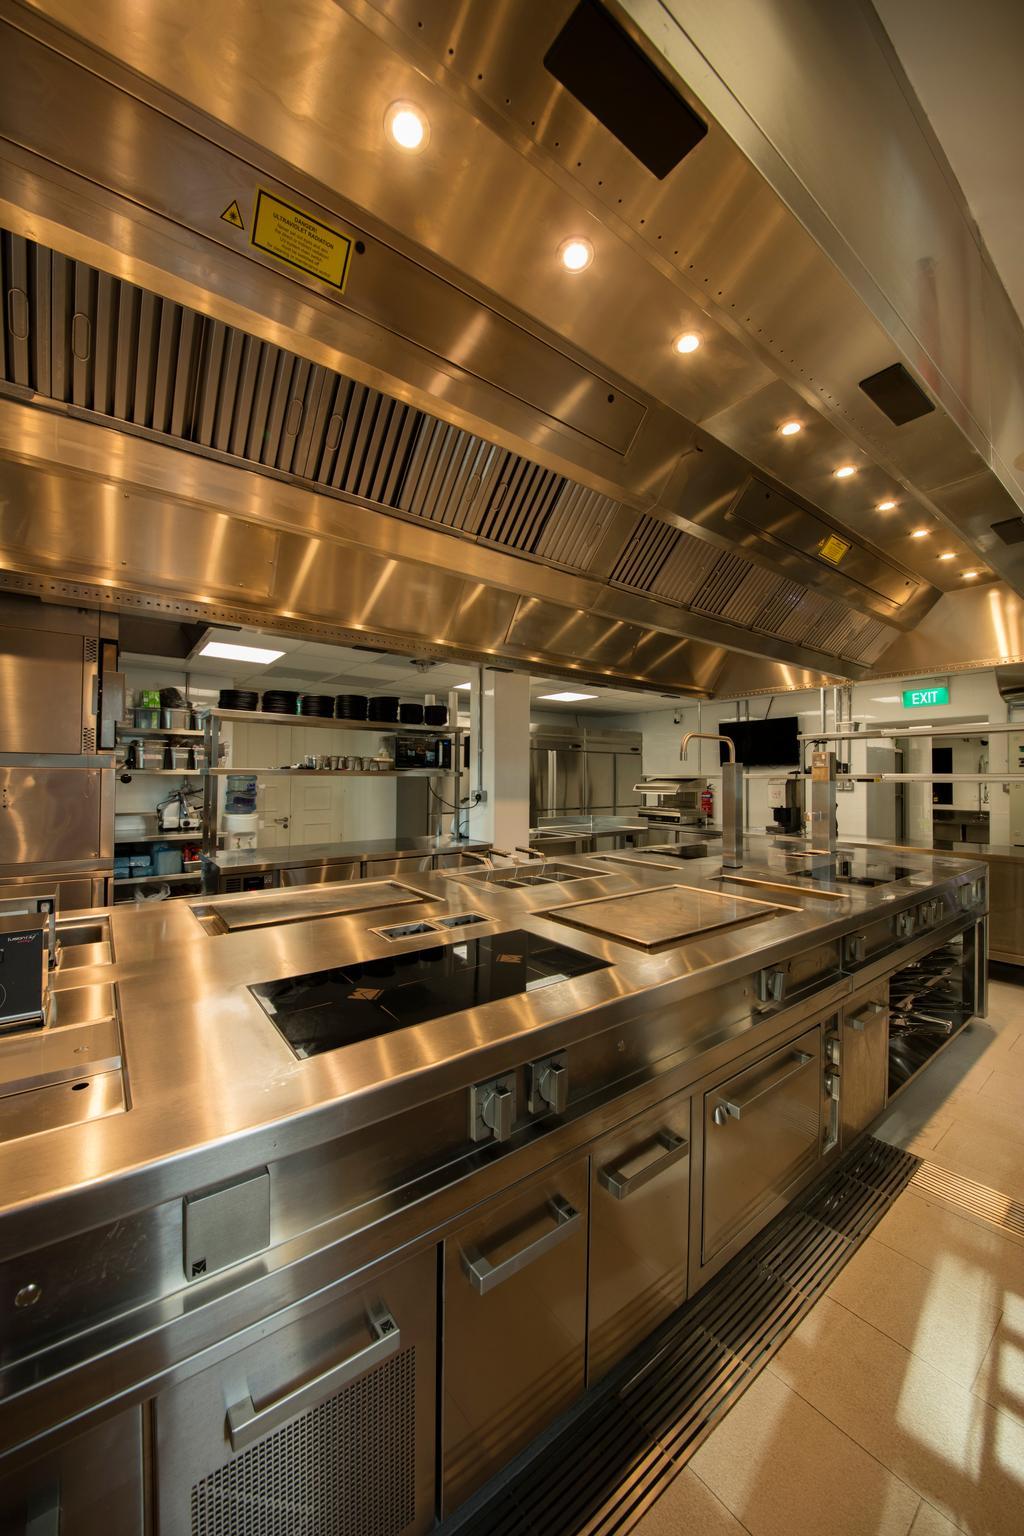 FOOD, Commercial, Interior Designer, Hue Concept Interior Design, Contemporary, Building, Factory